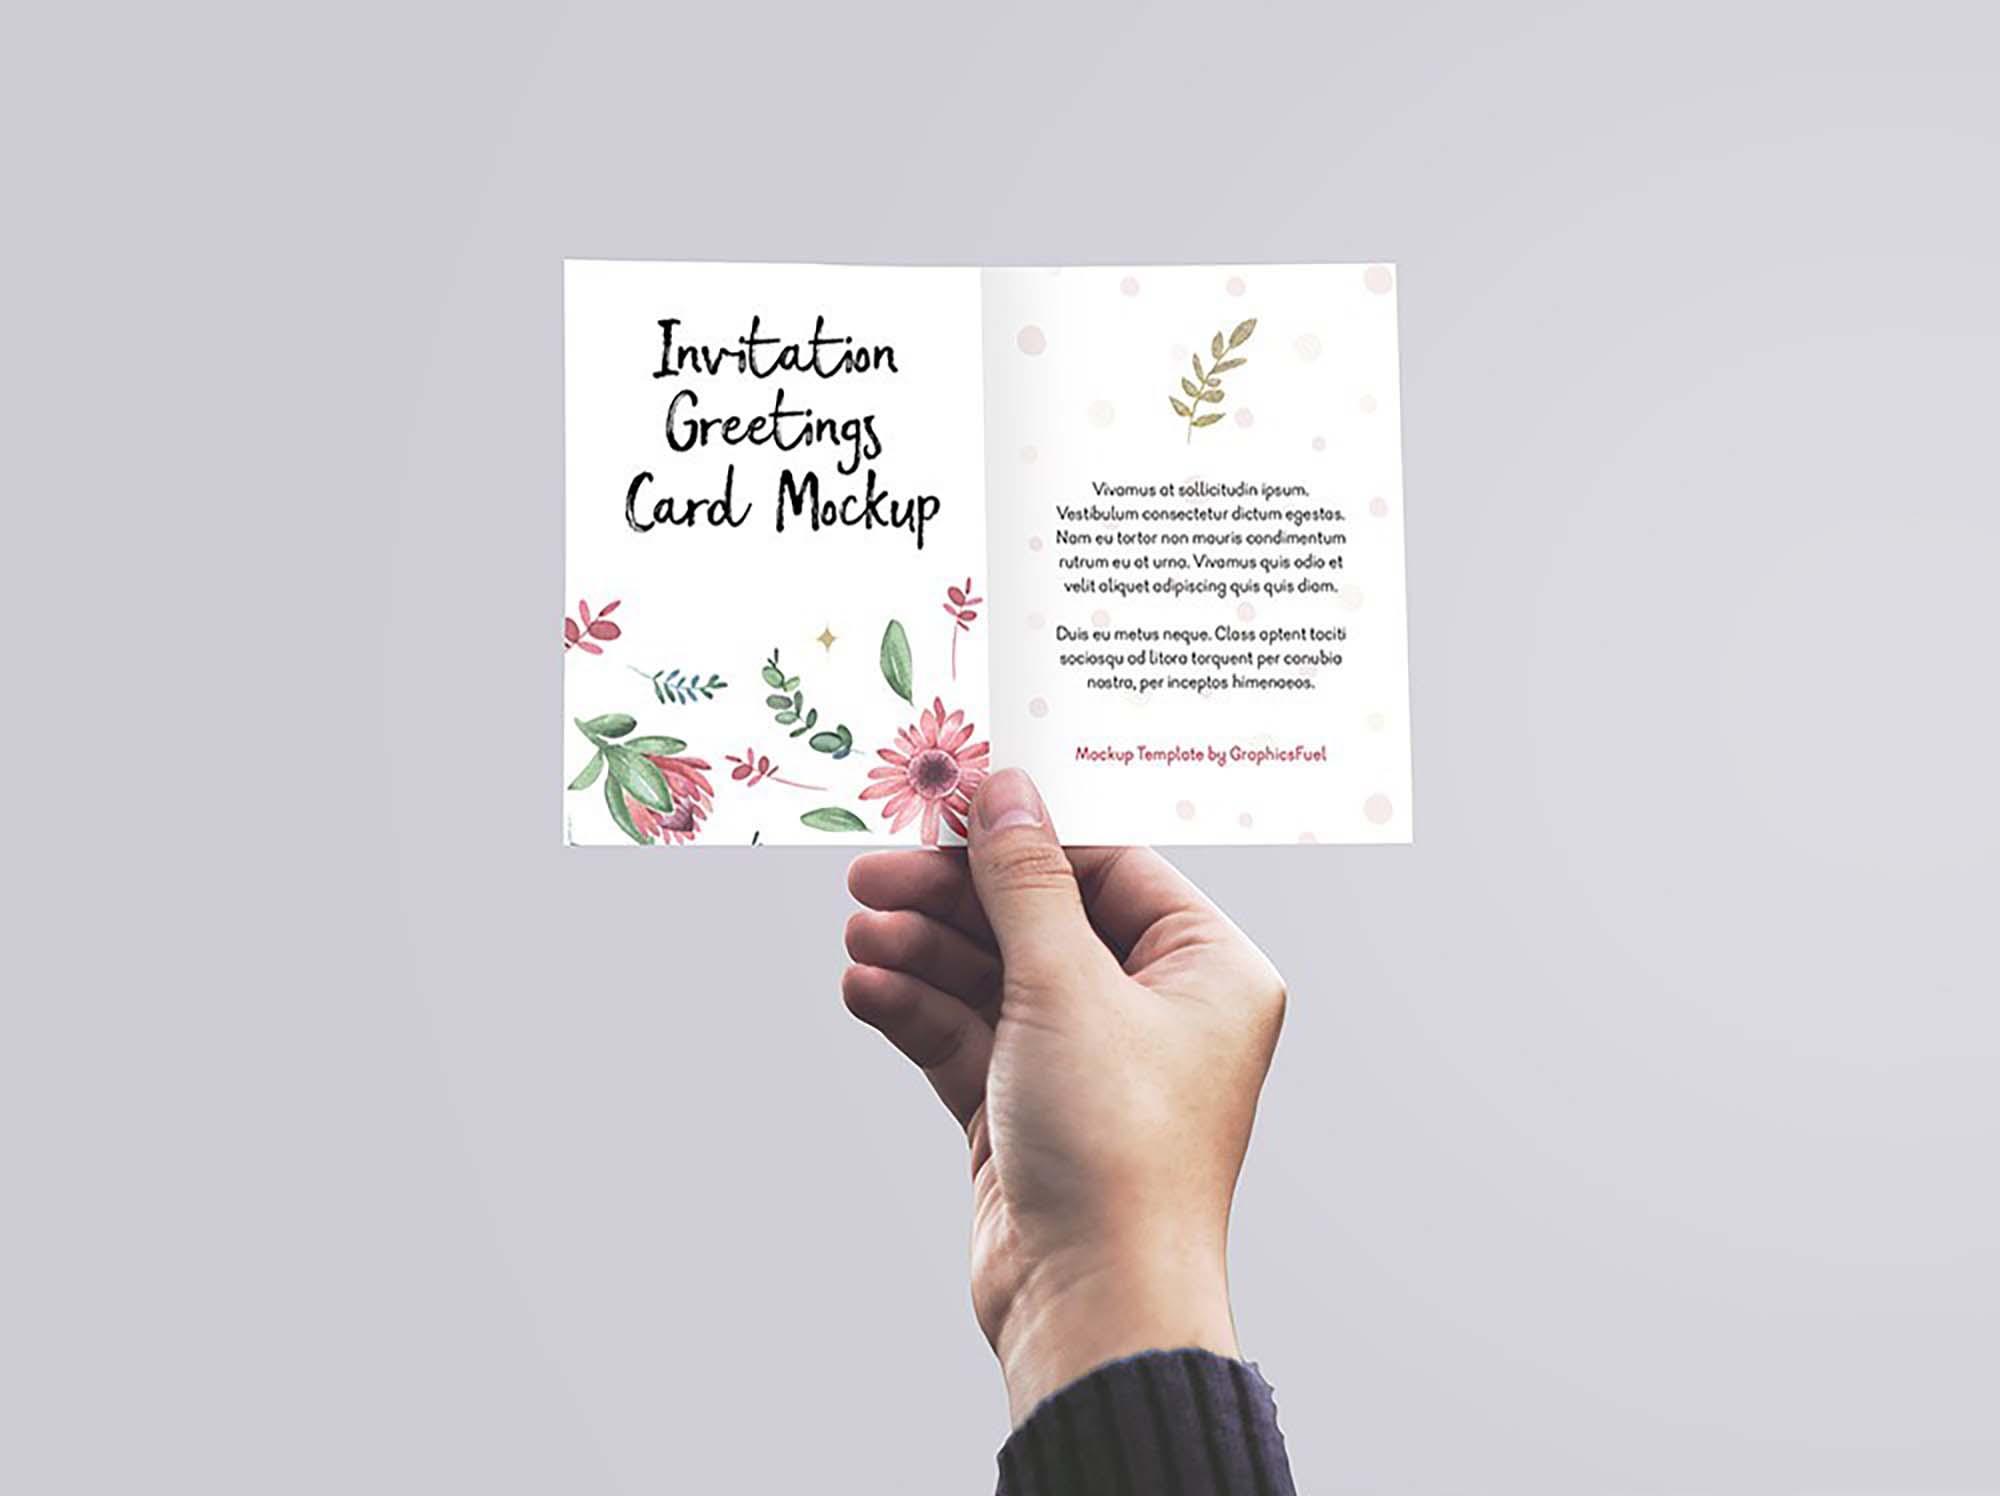 Free Invitation Greeting Card In Hand Mockup Psd